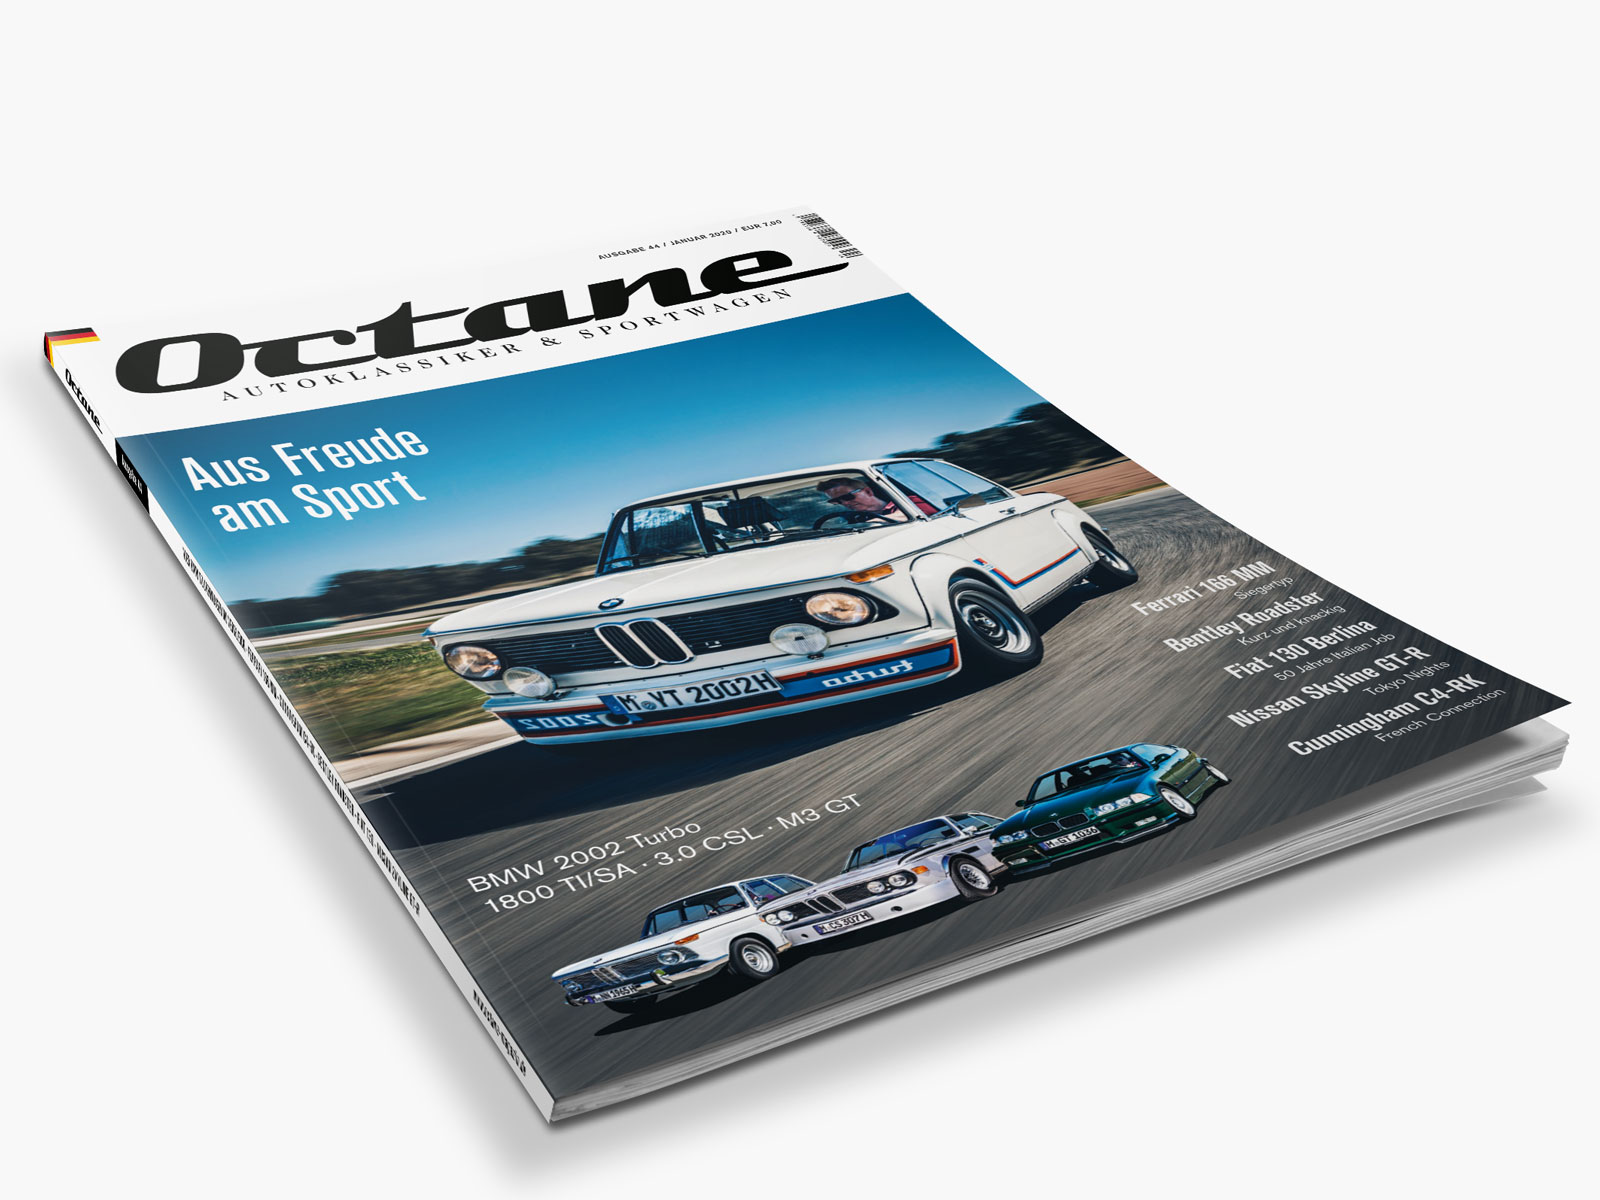 BMW 1800 TI/SA, BMW 2002 Turbo, BMW 3.0 CSL, BMW M3 GT, Tourenwagen, Rennsport